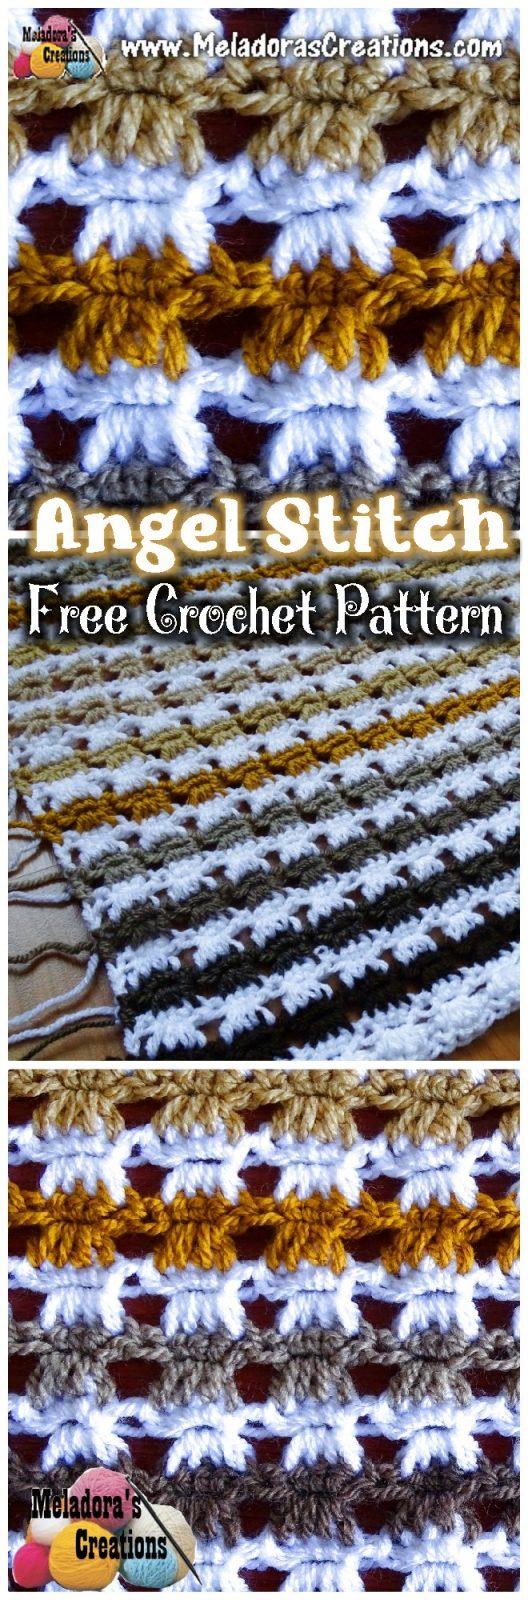 Angel Stitch - Crochet Stitch